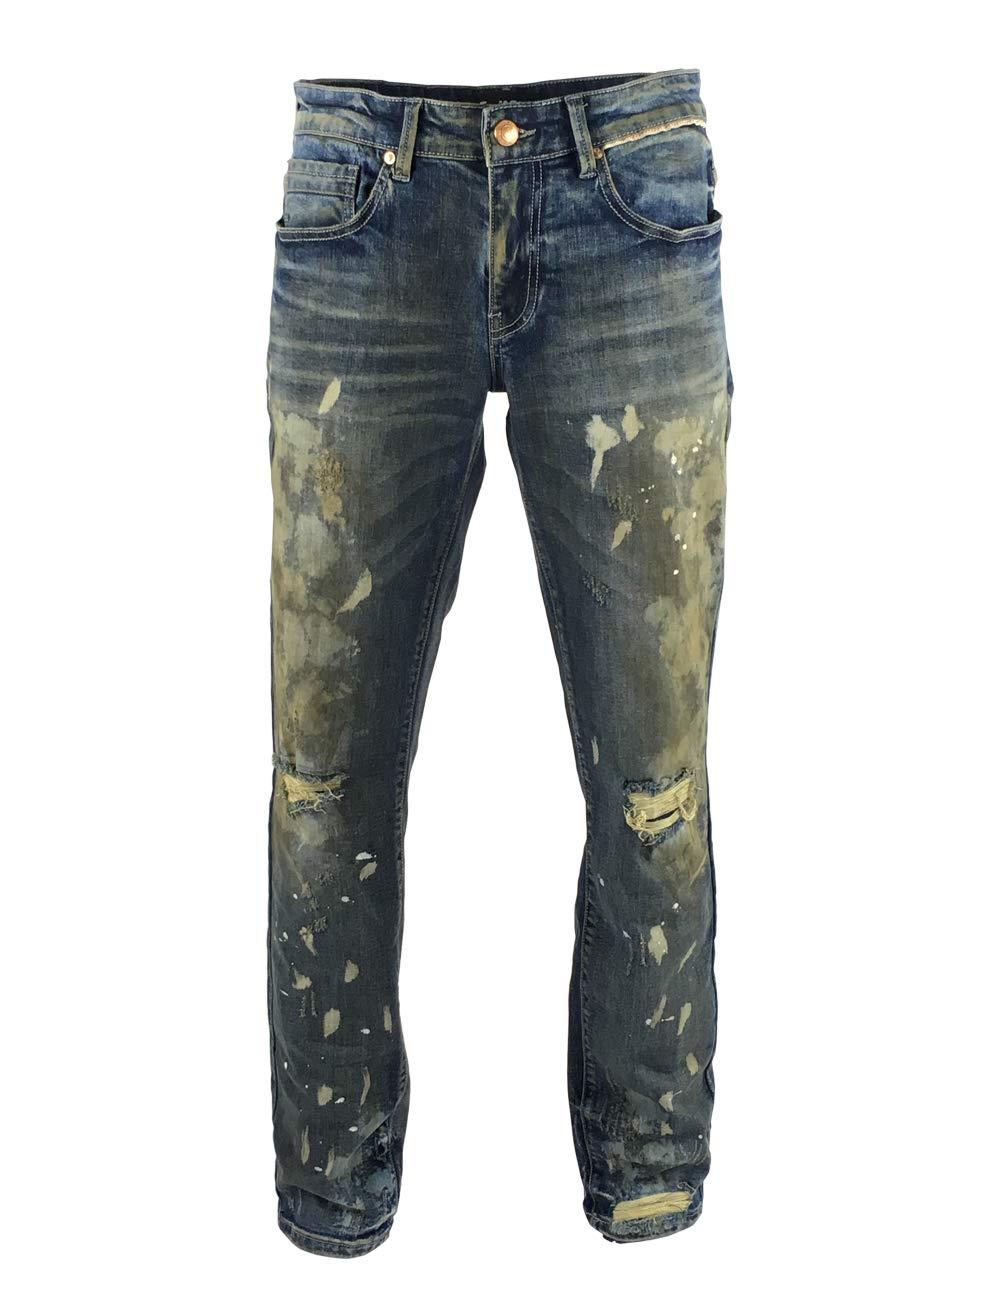 S-JACOL Men's Denim Biker Moto Destroyed Skinny Spray Paint Jeans with Holes